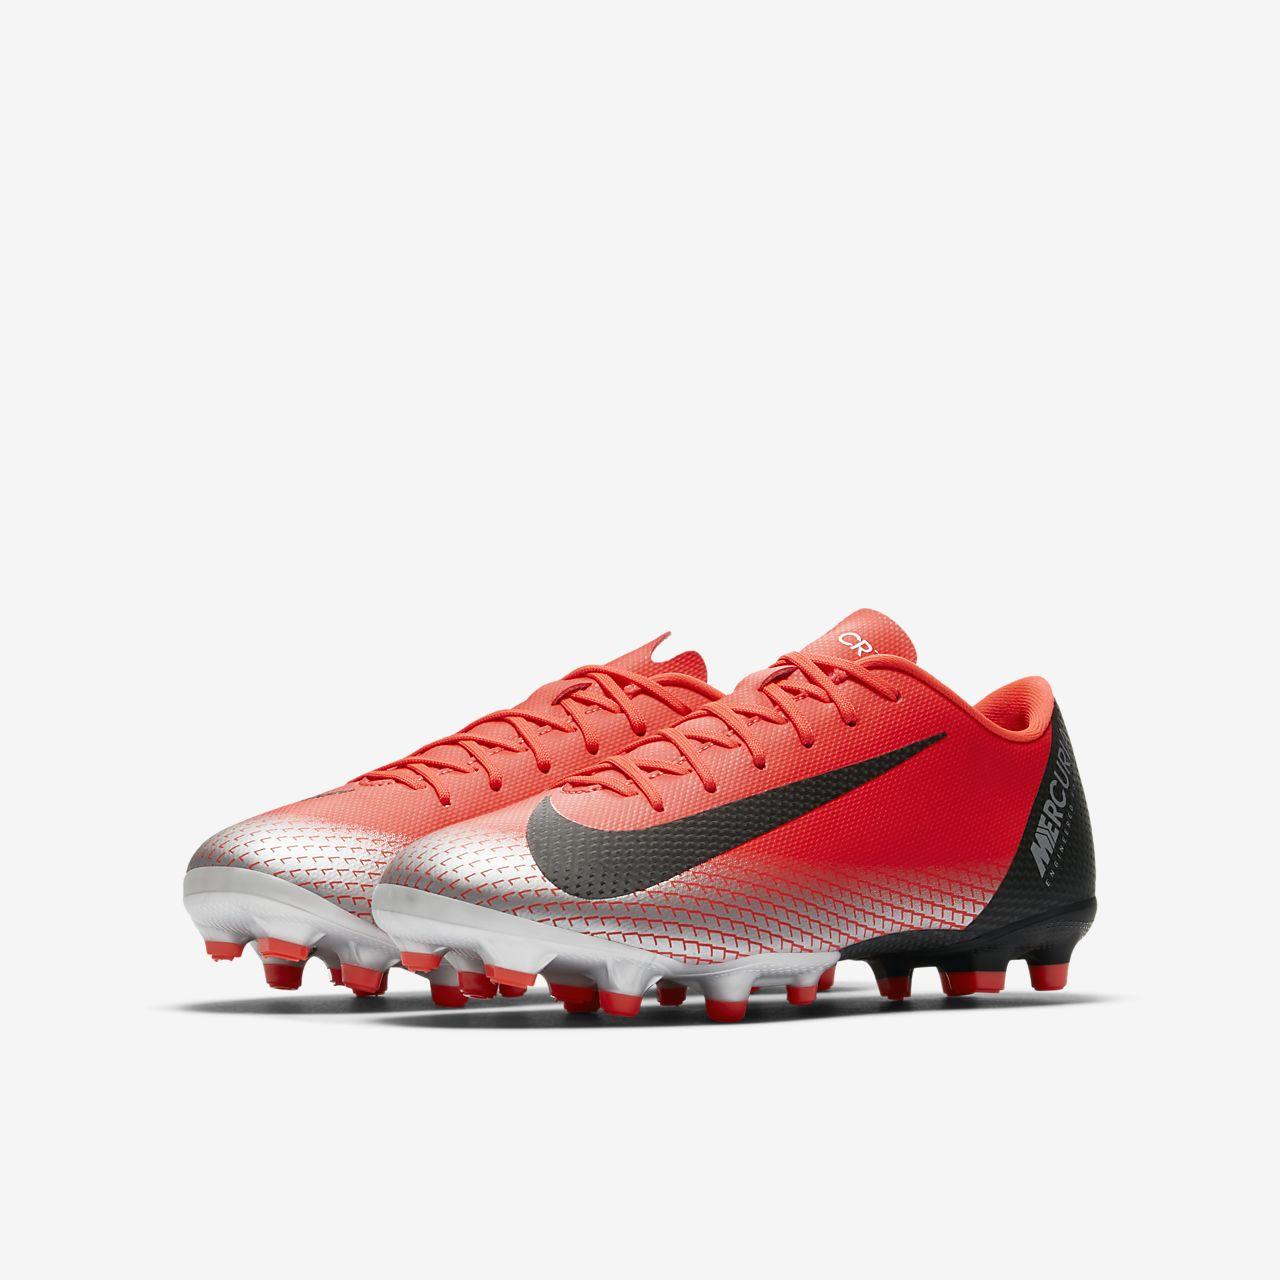 ... Calzado de fútbol para múltiples superficies para niños talla  pequeña grande Nike Jr. Mercurial f1a23c3fec233